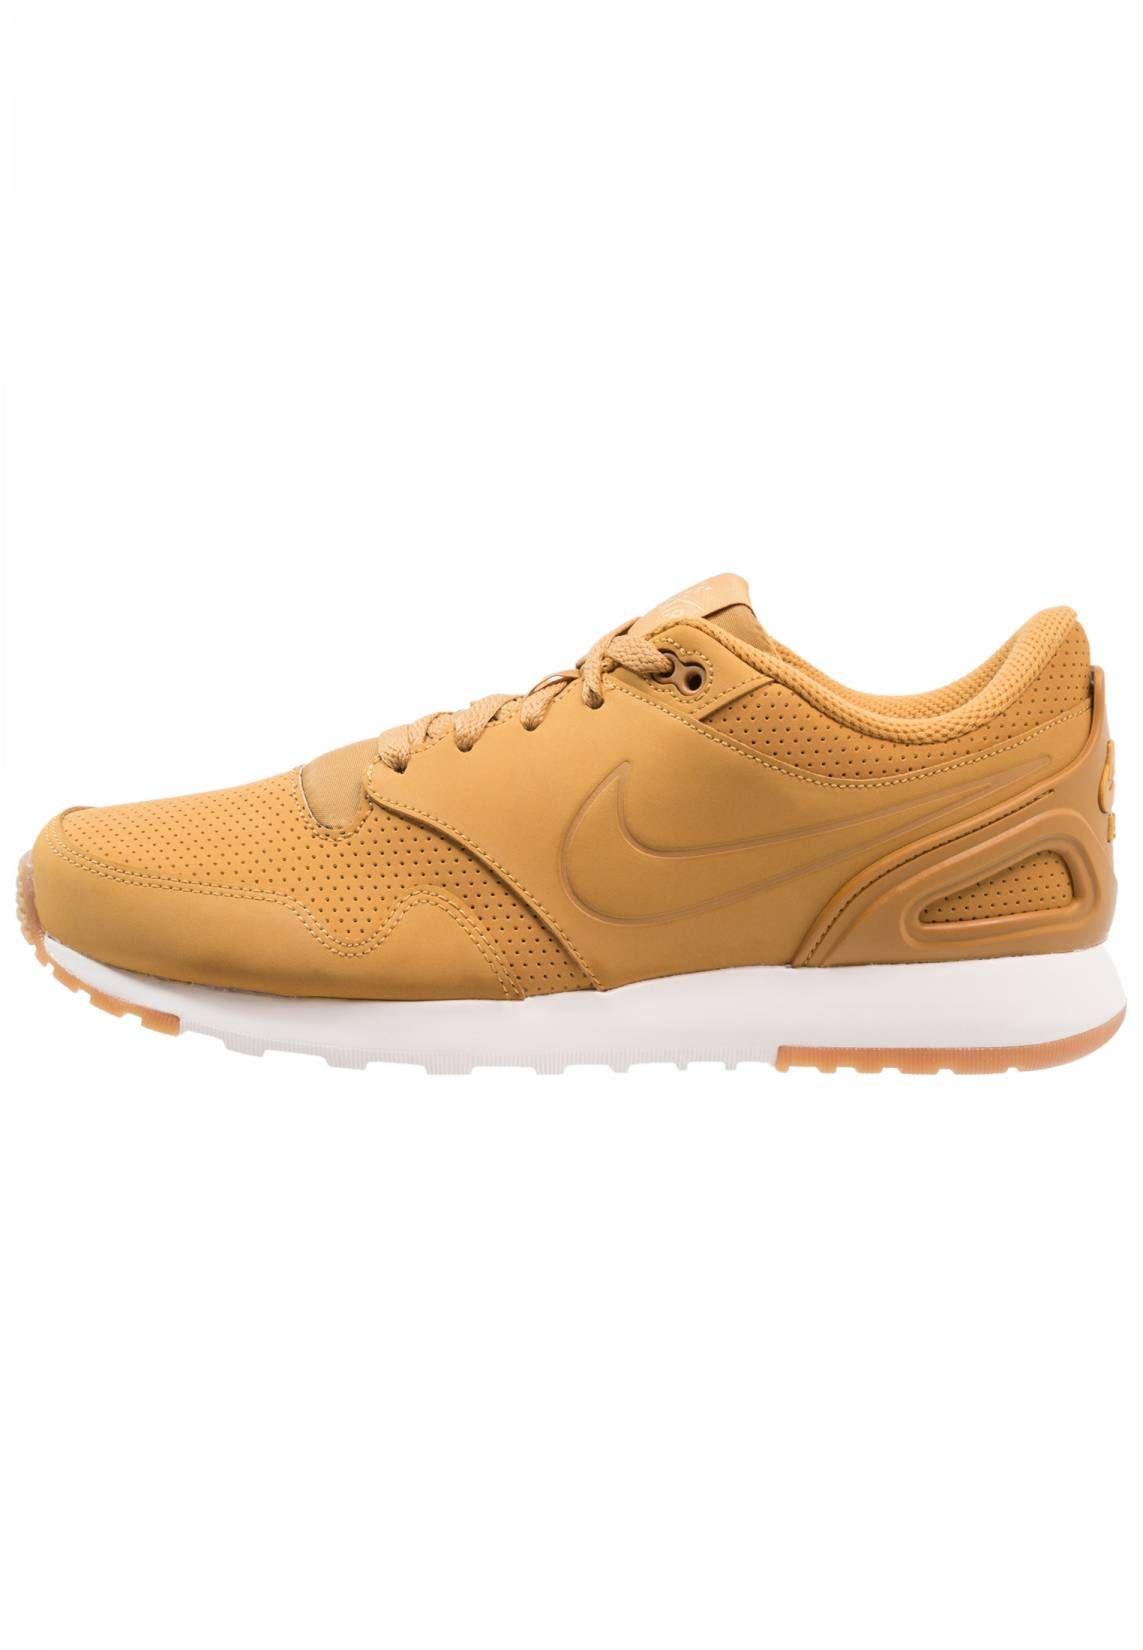 Nike Sportswear. AIR VIBENNA PREM - Zapatillas - wheat ivory metallic gold. 7692bb3658ec